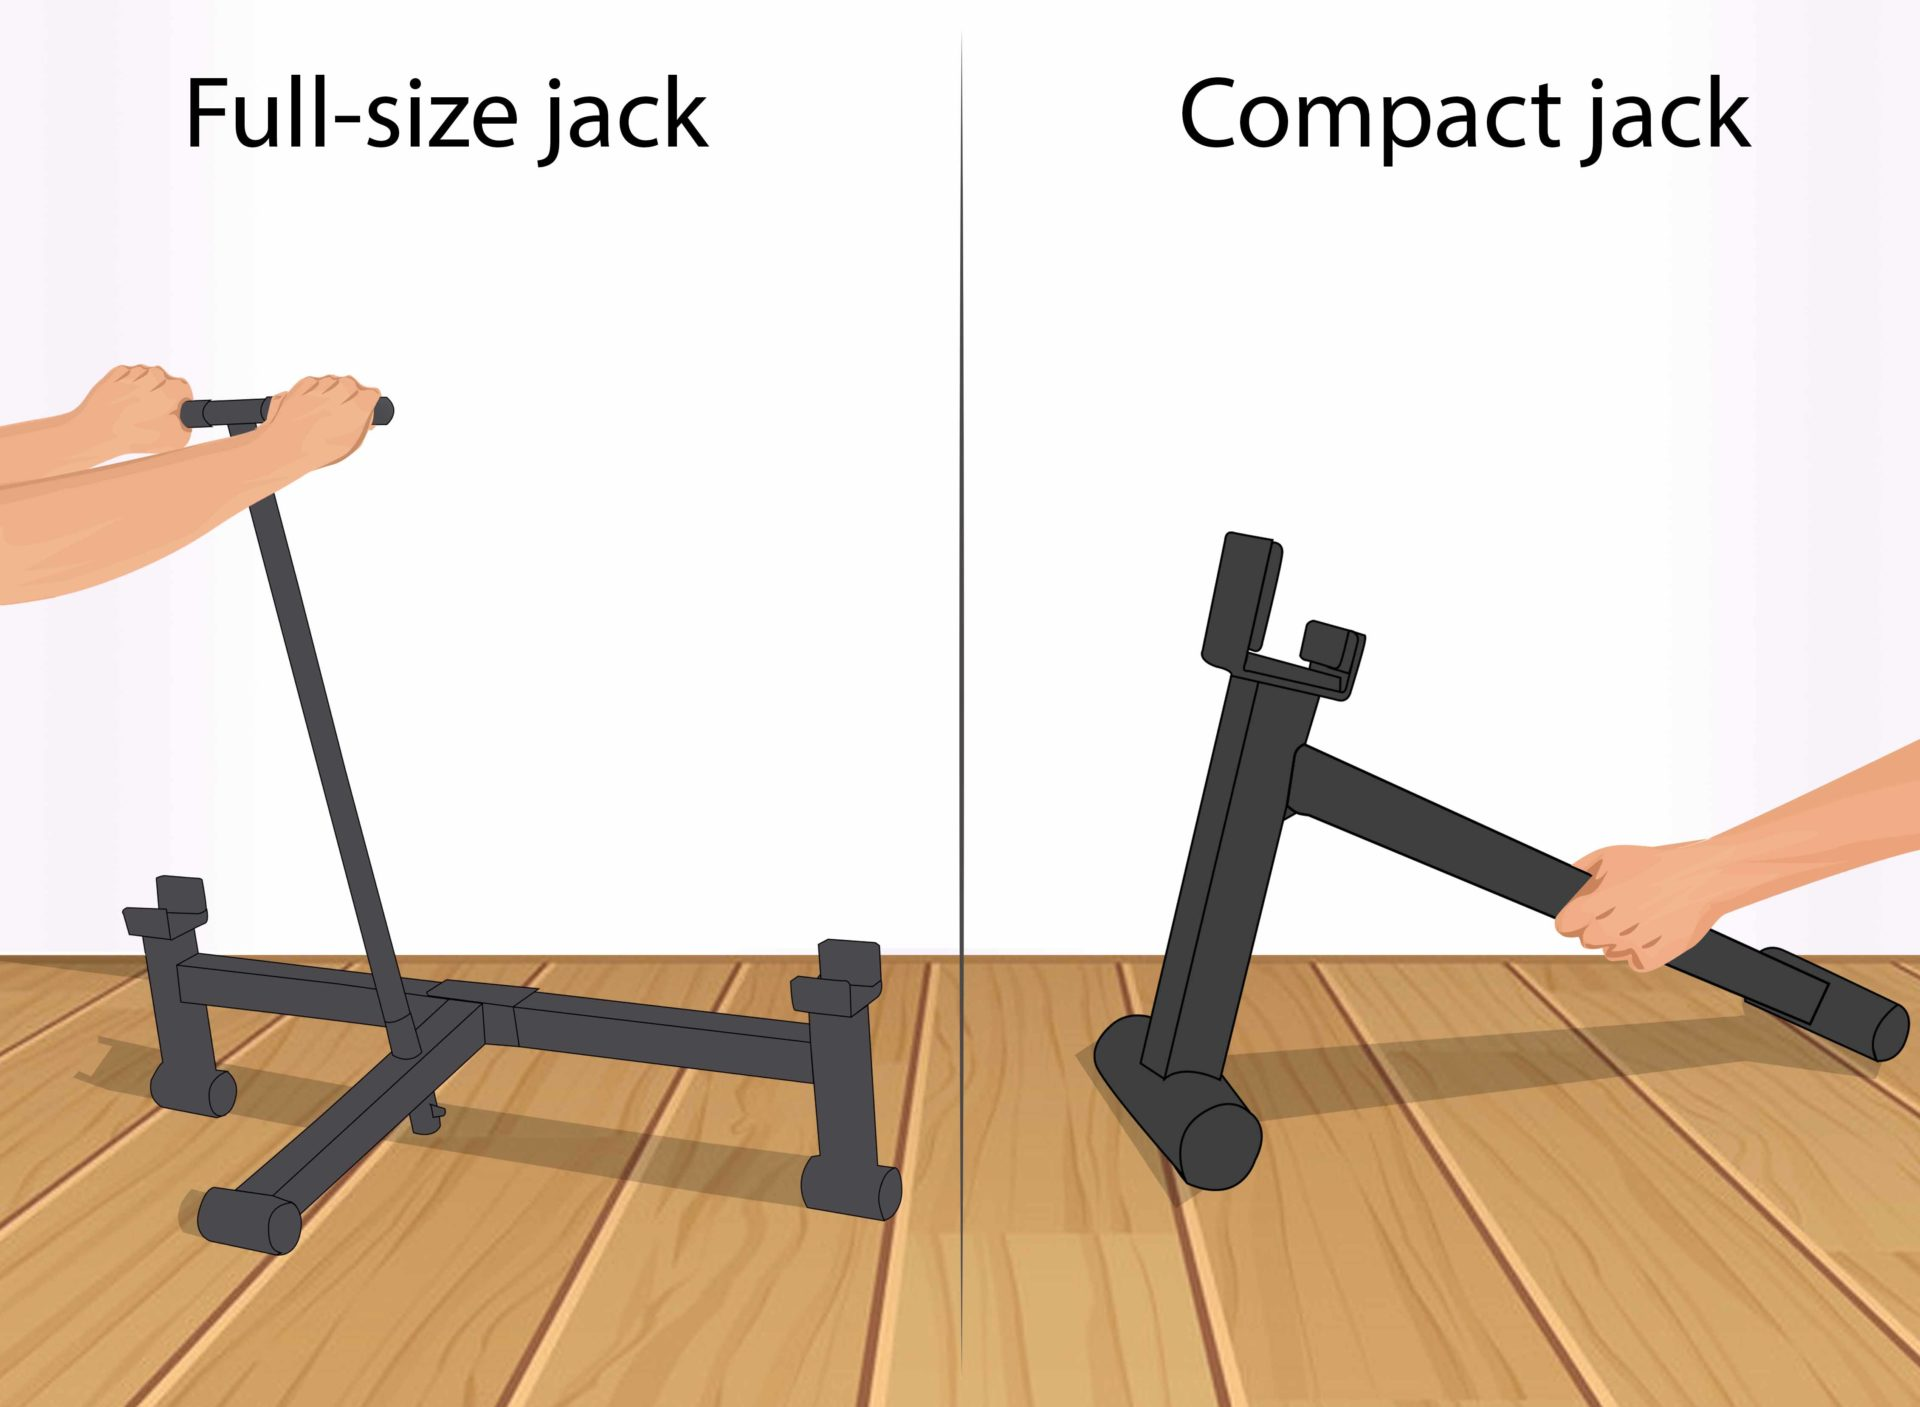 Compact jack vs. Full-size jack